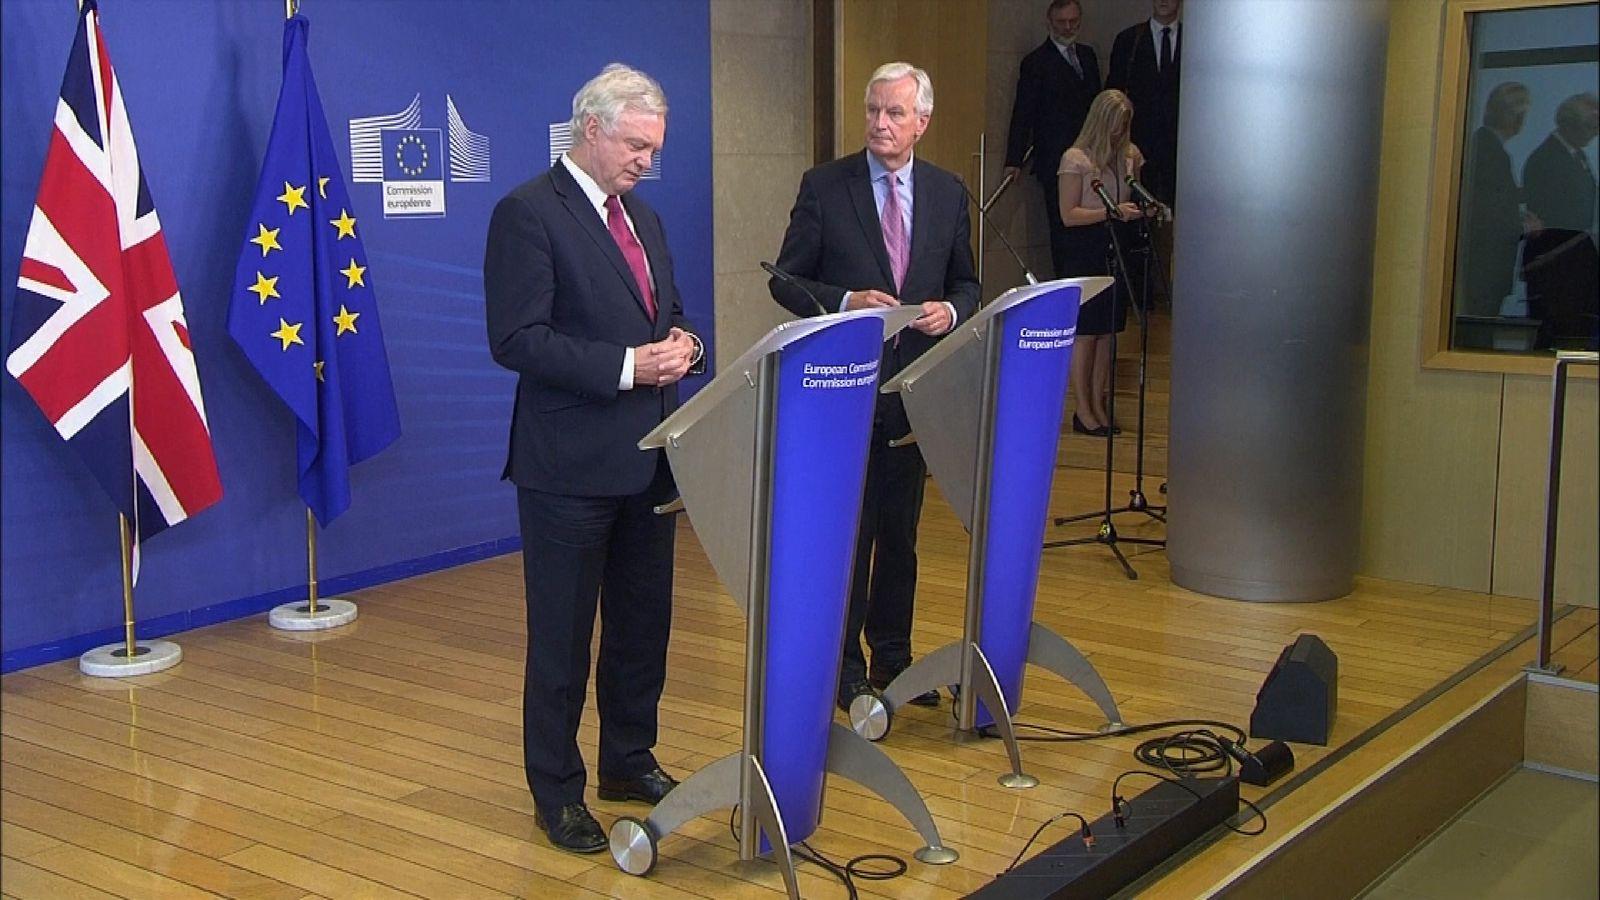 Brexit Secretary David Davis (L) and the EU chief negotiator Michel Barnier